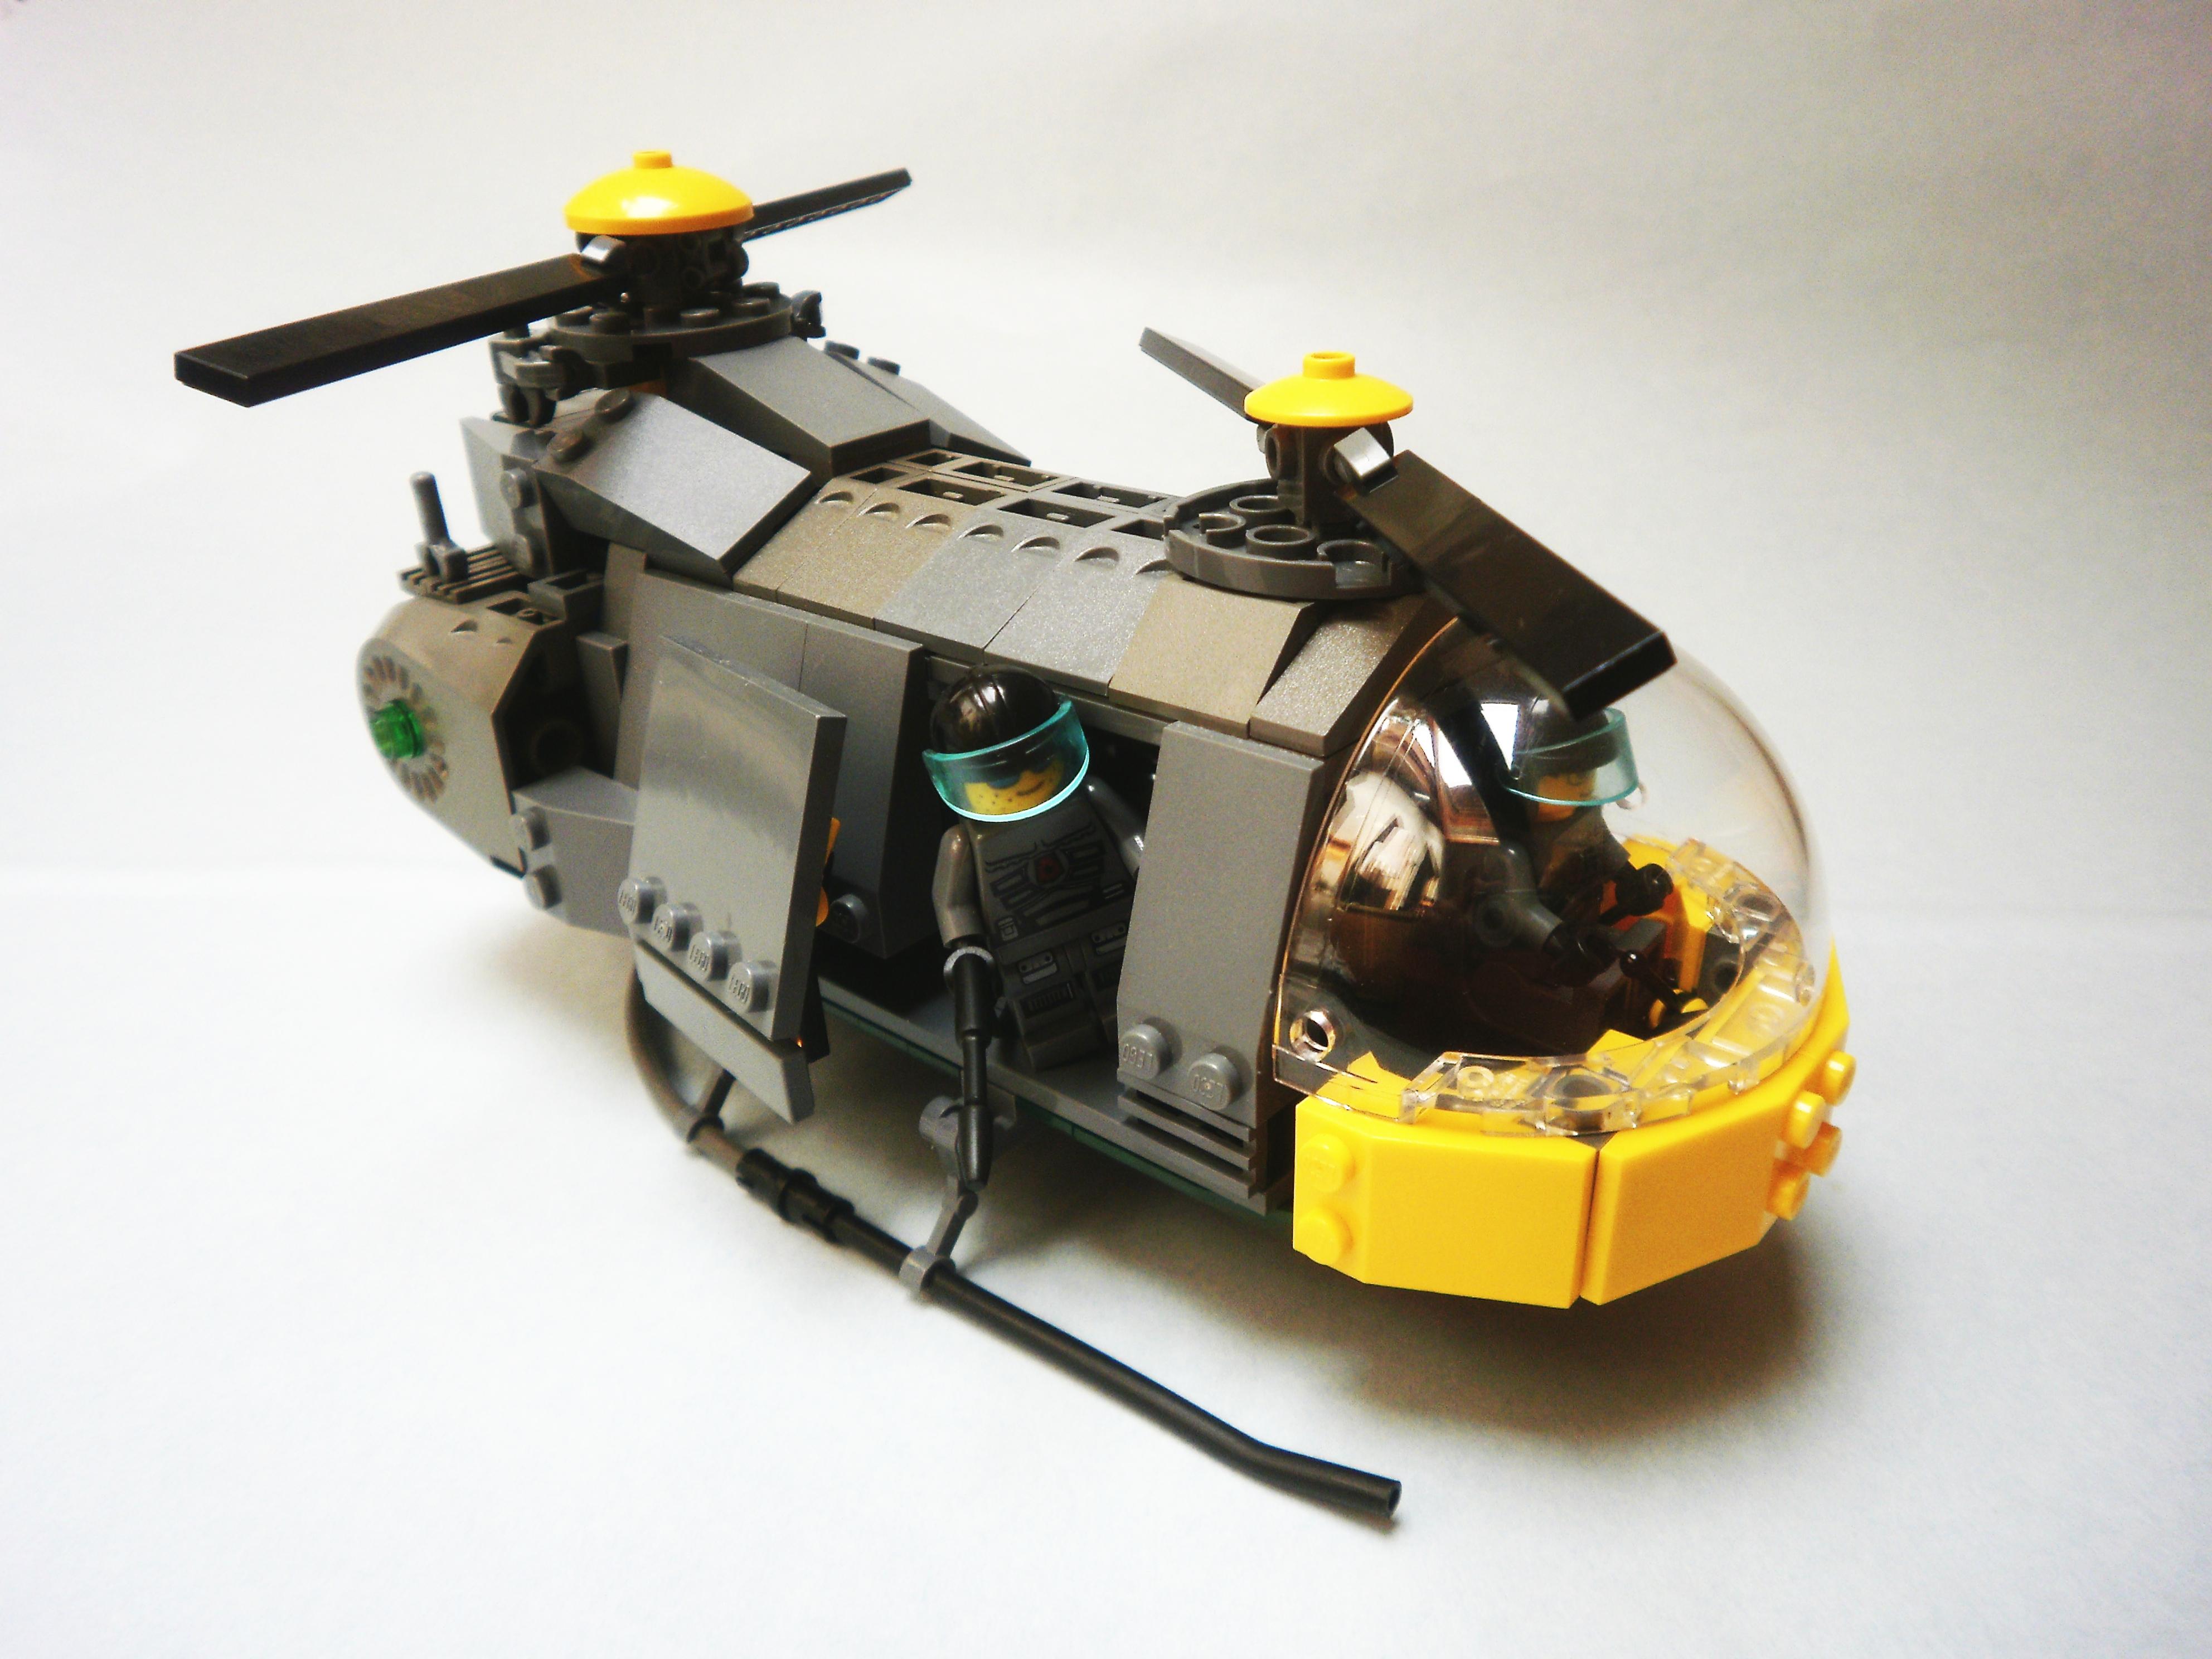 Lego Star Wars Bedroom Decor